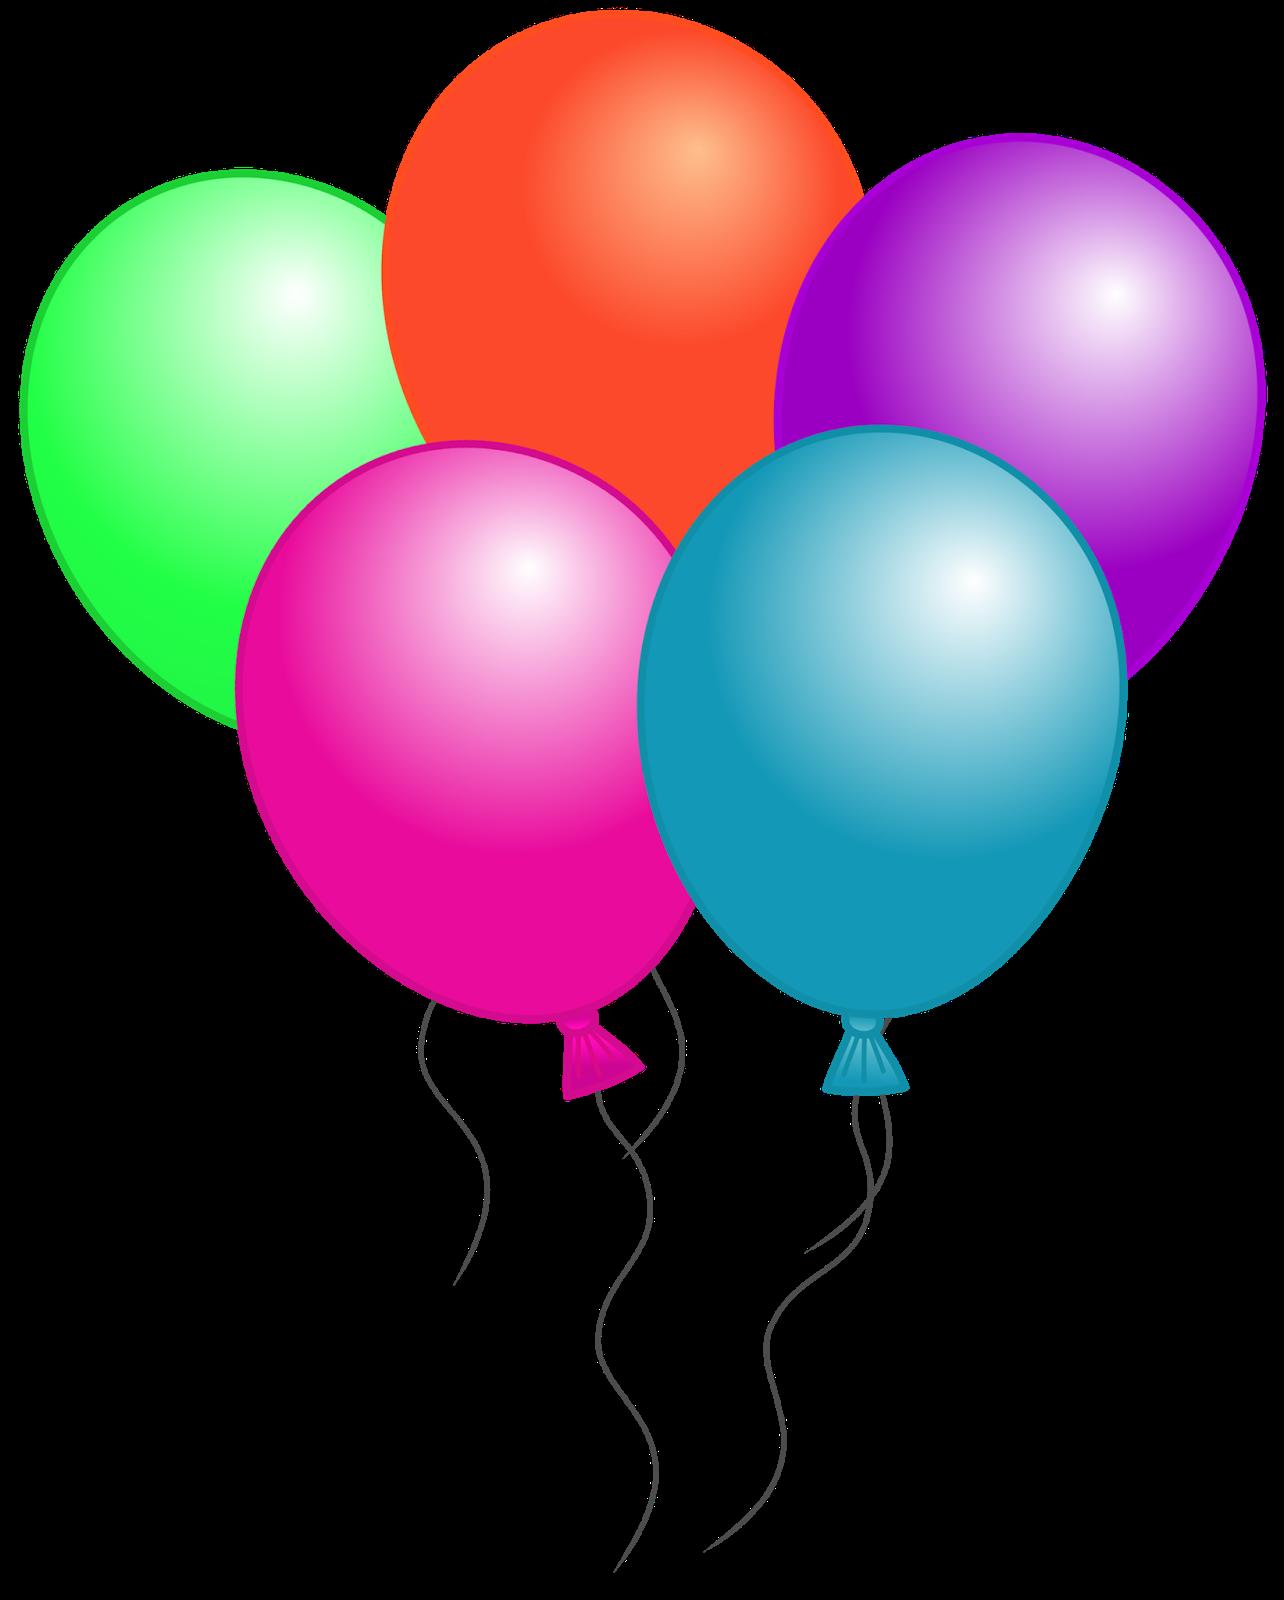 classroom treasures clip art clip art birthday balloons for girl clipart birthday balloons corner